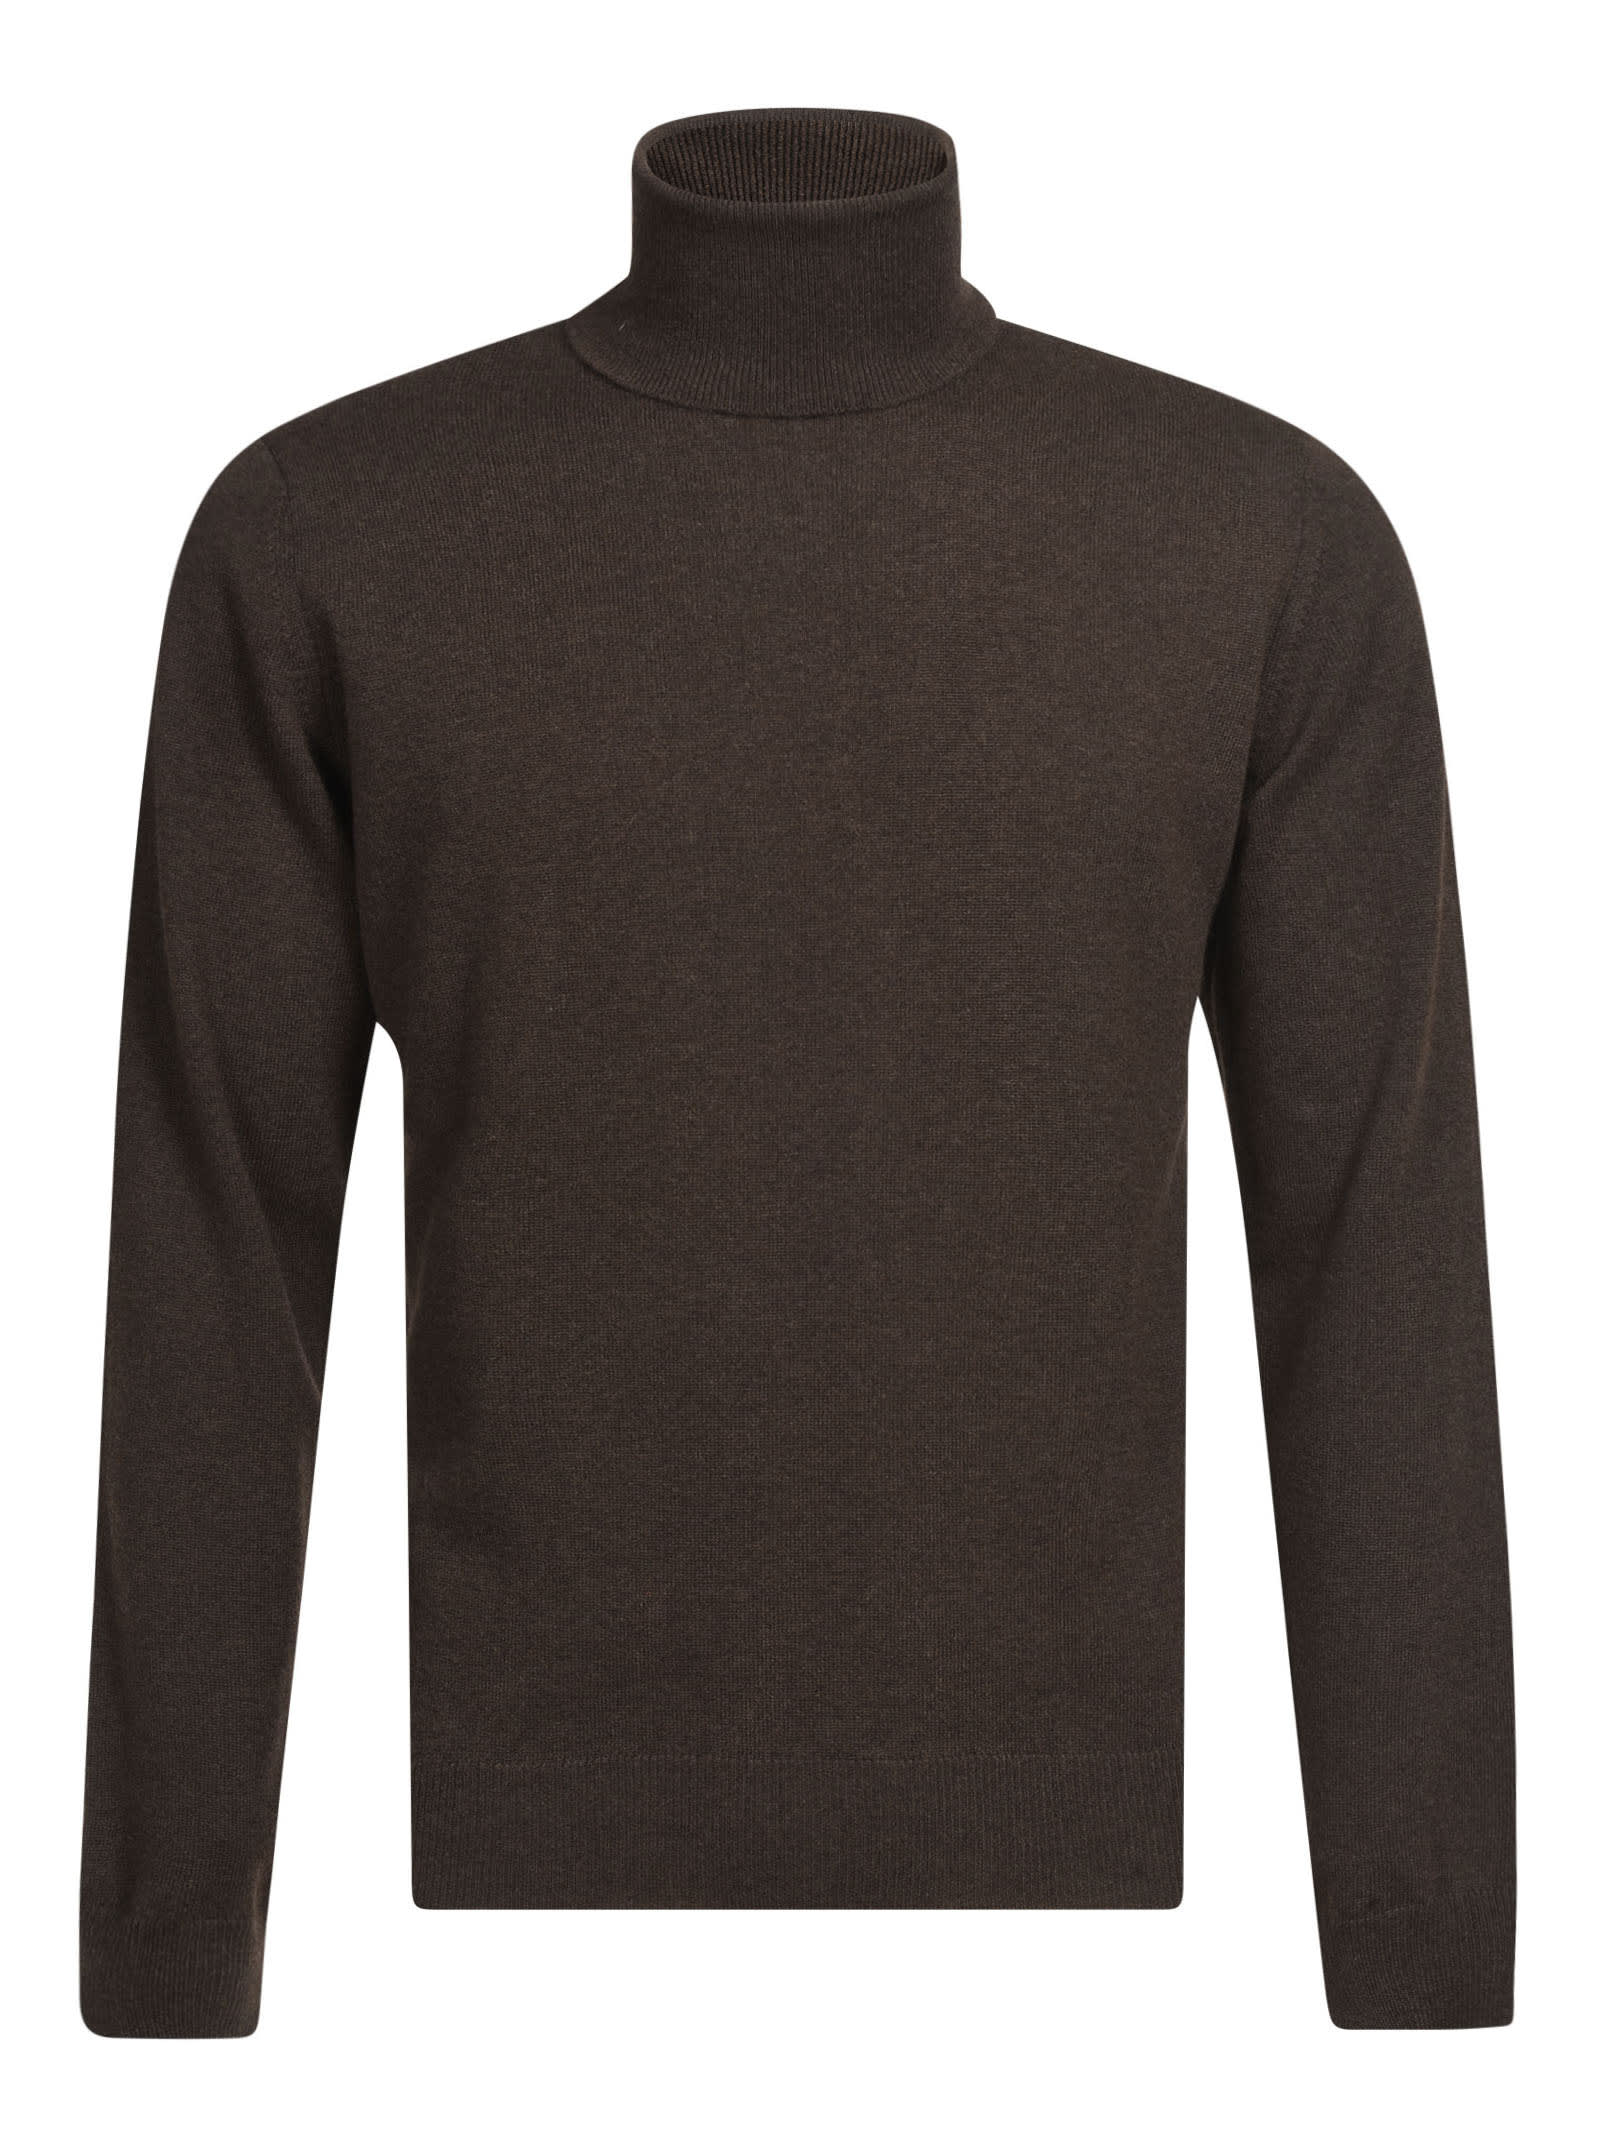 Turtleneck Plain Sweater